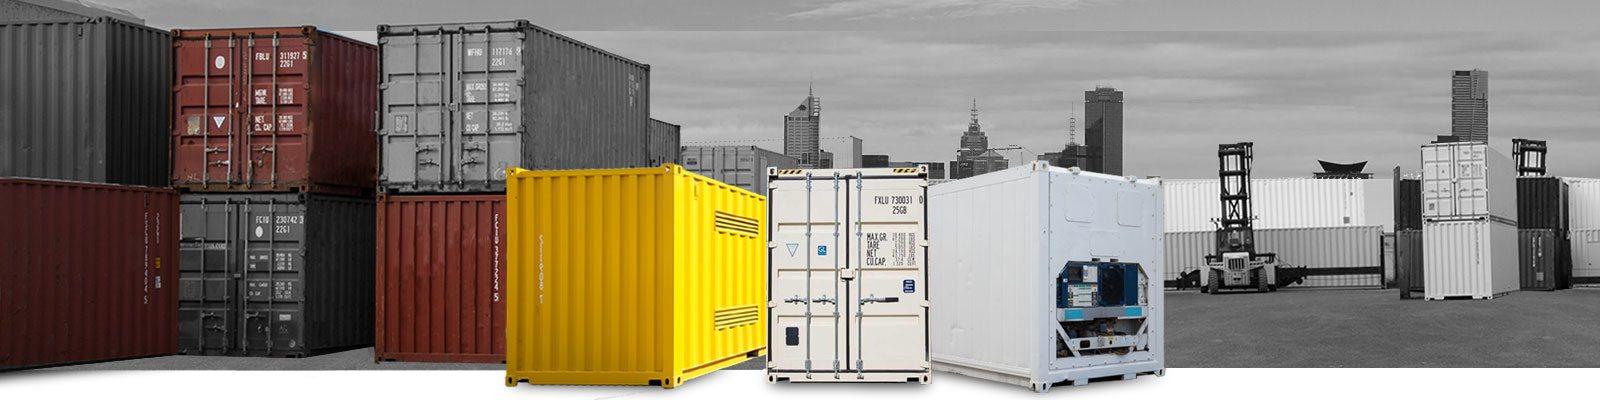 container hire Brisbane